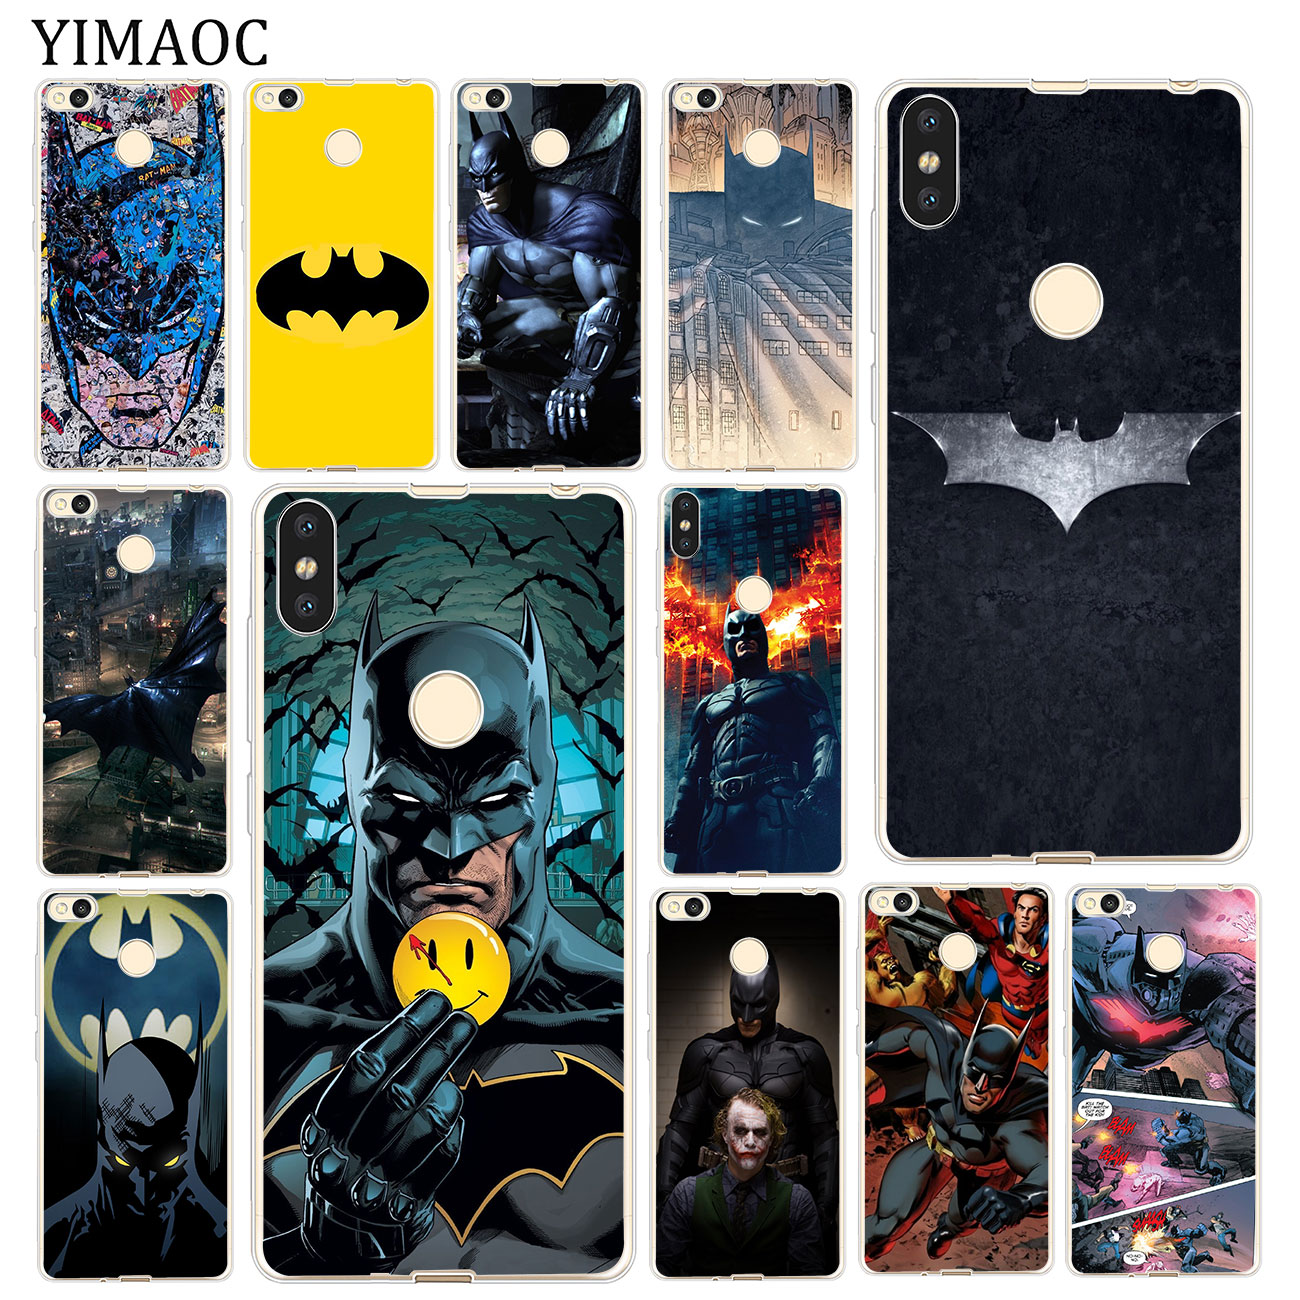 Results Of Top Xiaomi Mi A1 Case Batman In Nadola Softcase Redmi S2 Yimaoc The Dark Knight Dc Soft For A2 Lite 8 Se 6 6x 5x Mix 2s 4a Note 4 4x 5 Pro Plus 5a